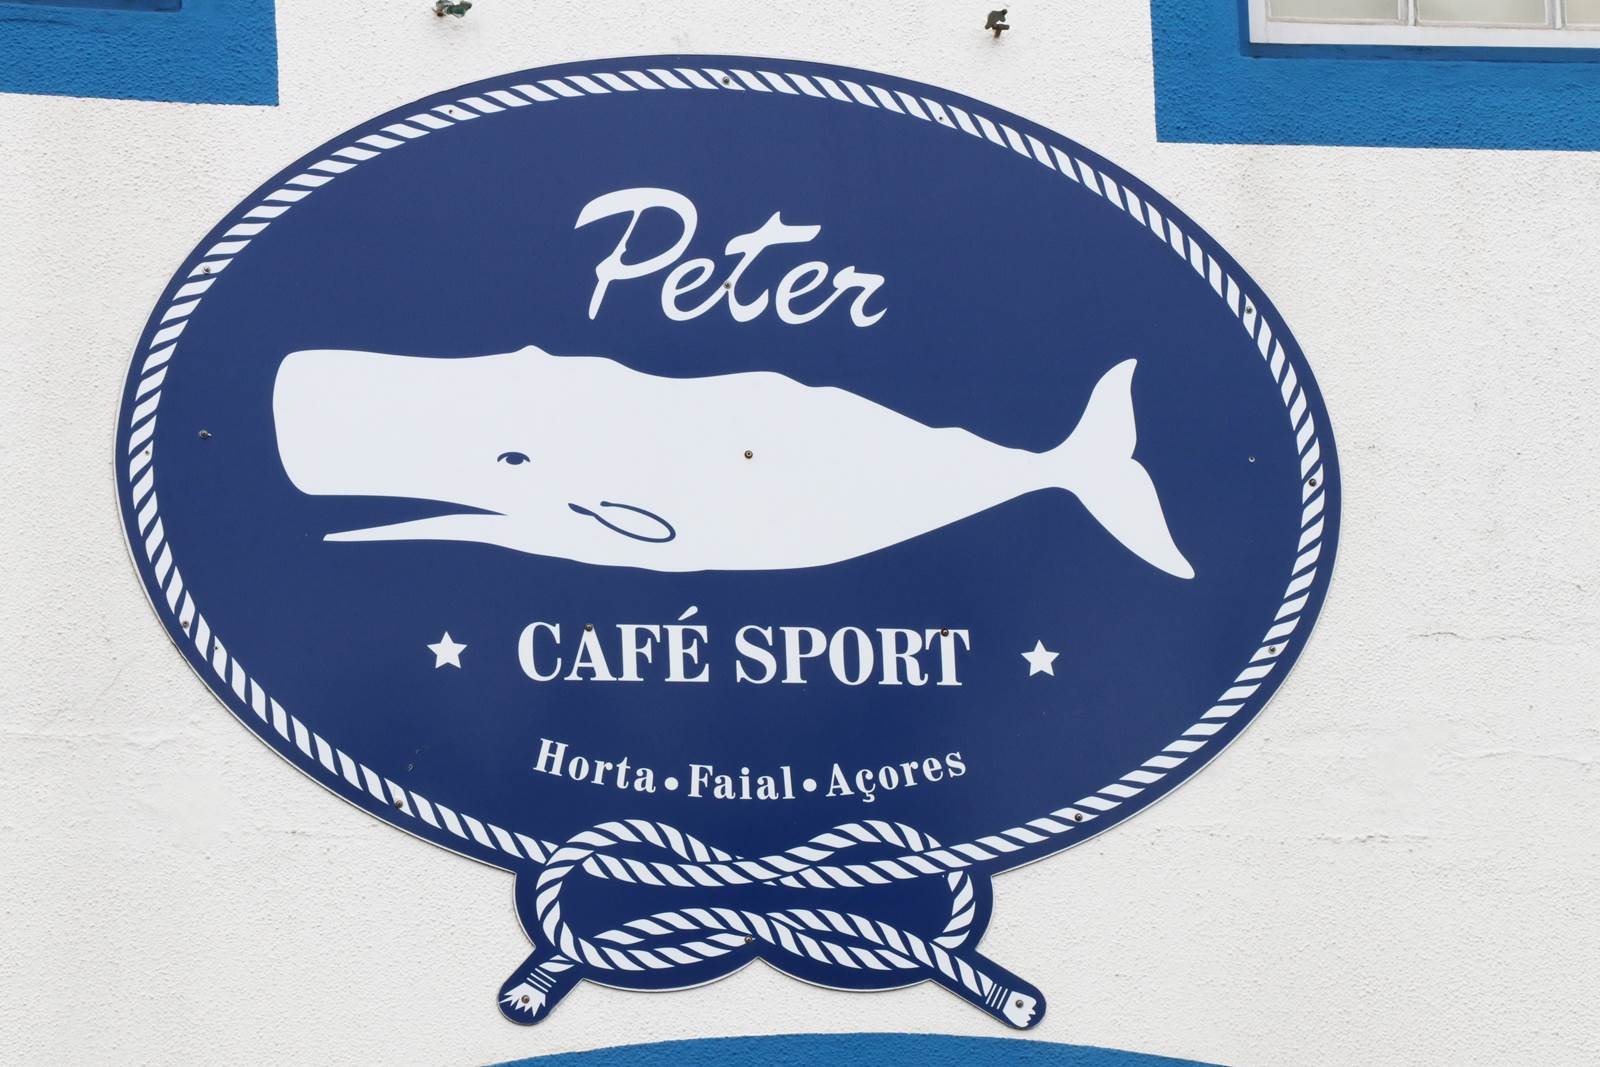 Faial Peter Café Sport